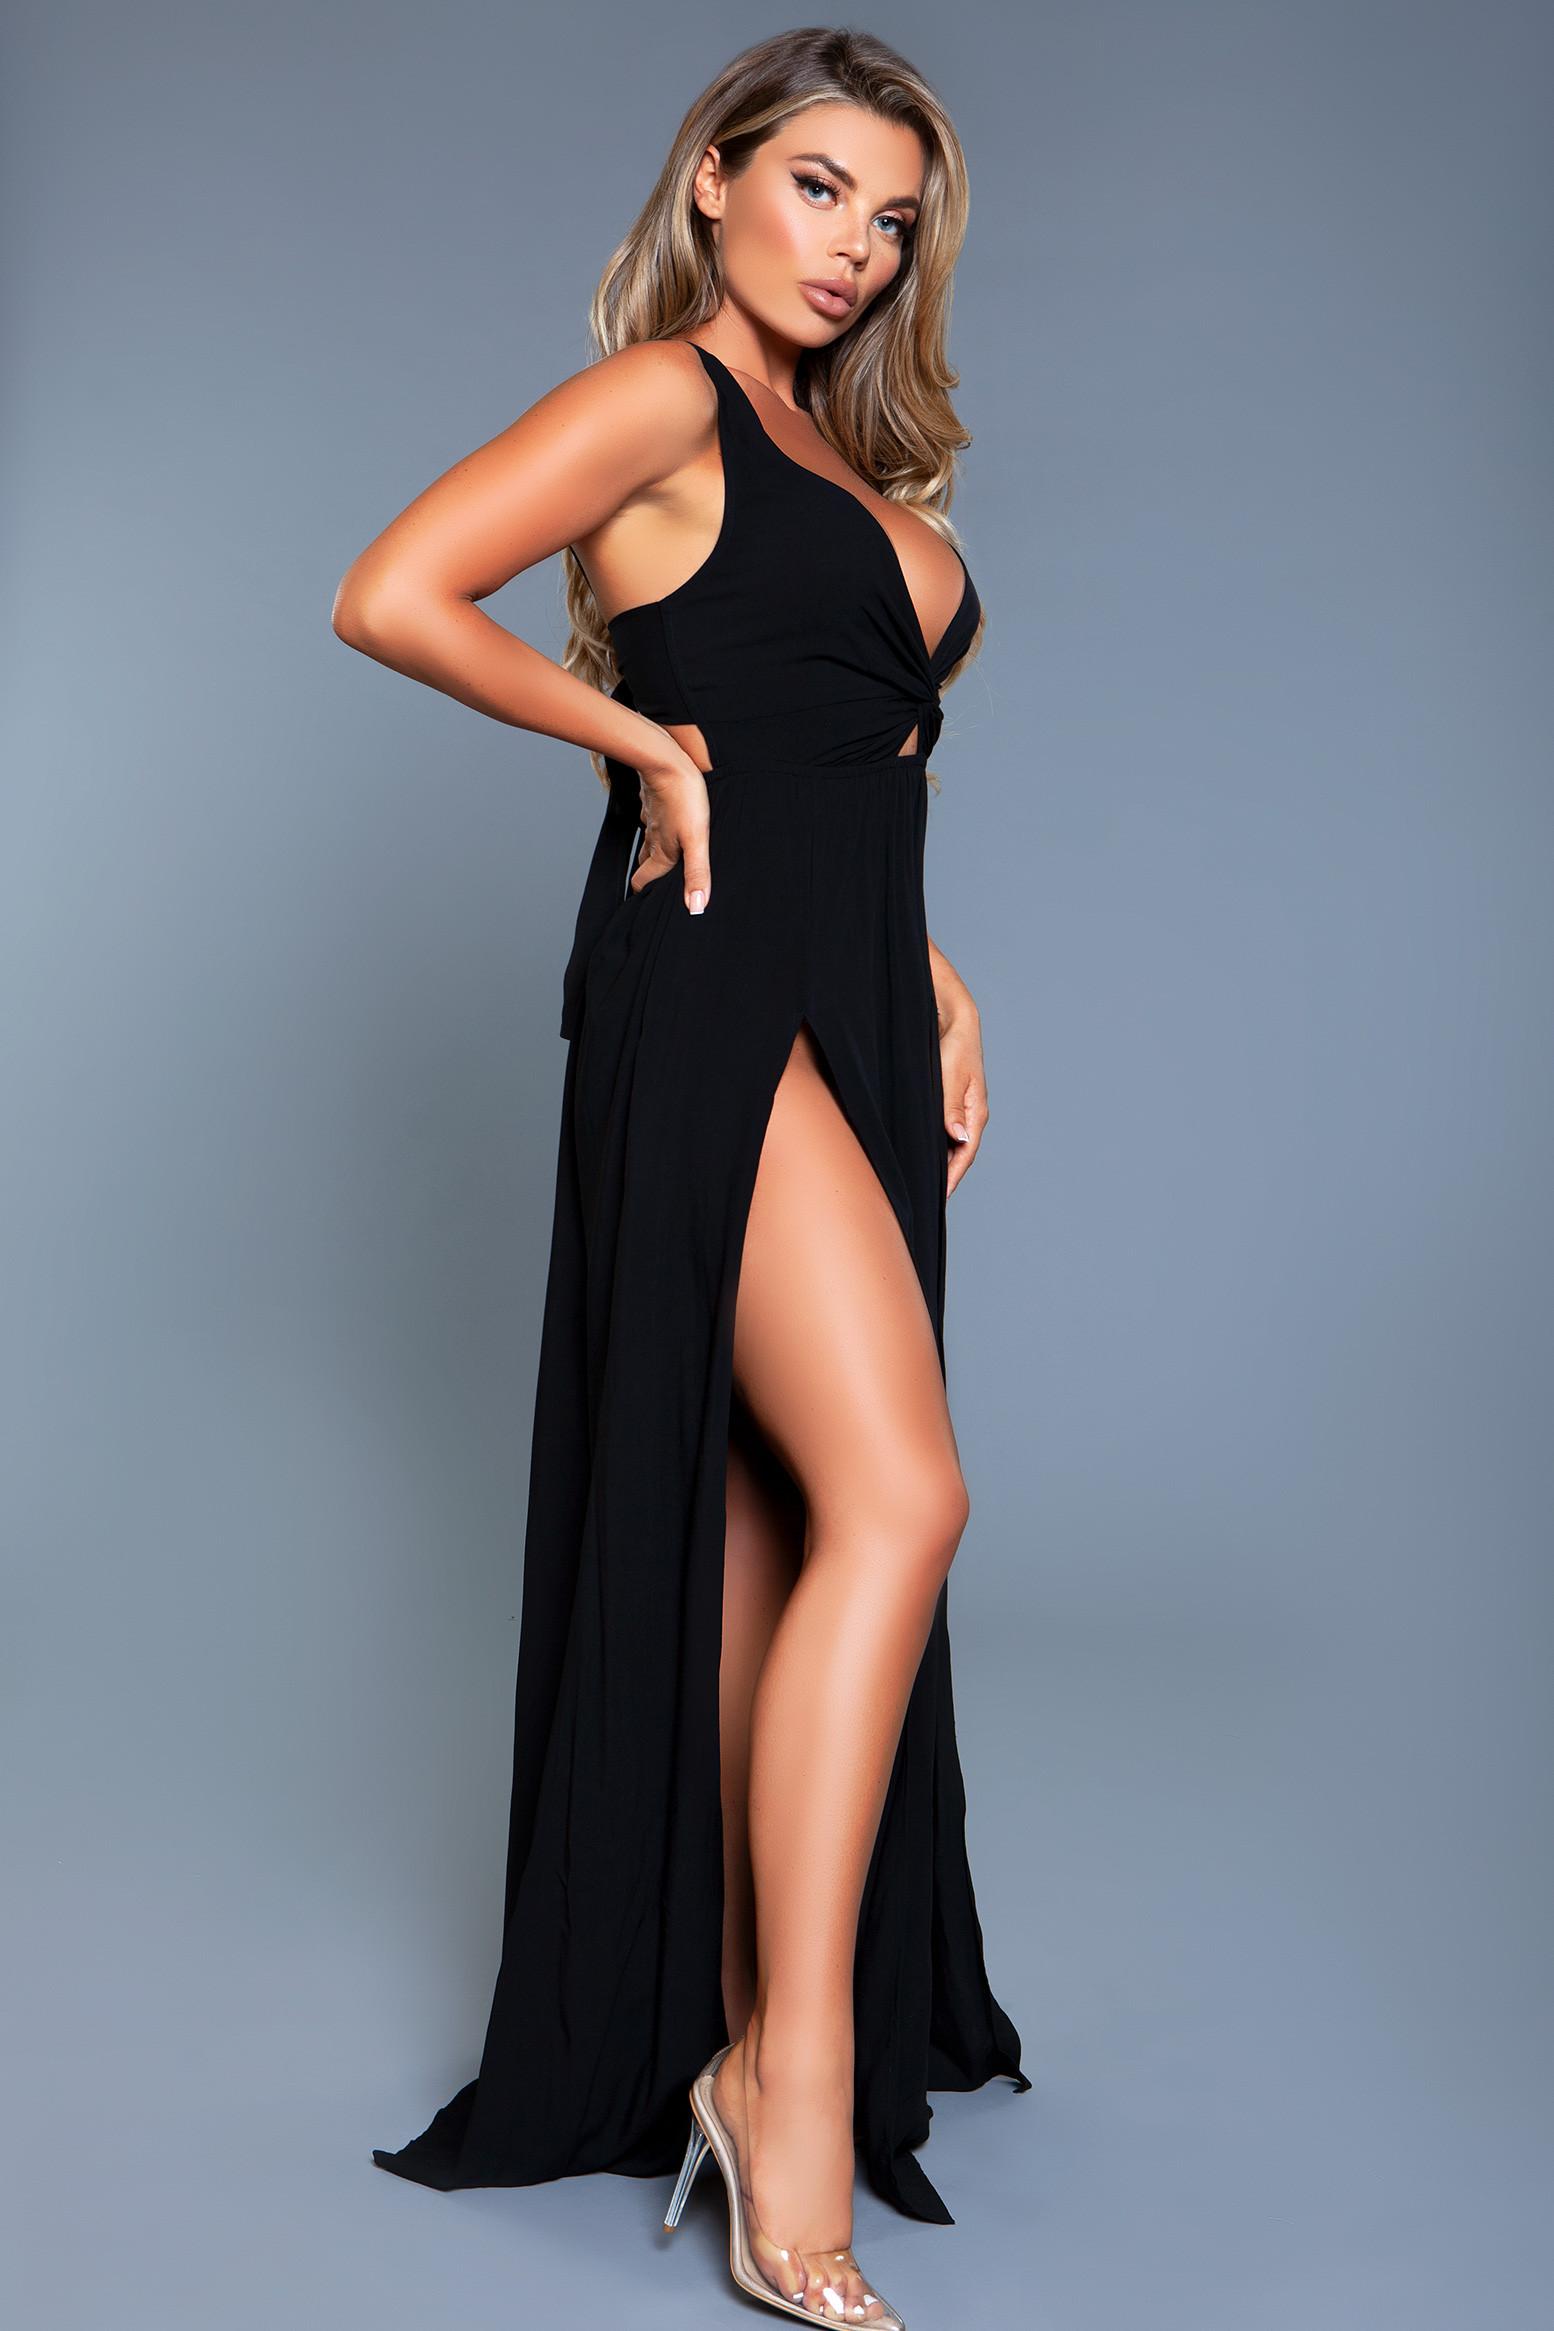 2134 Freya Maxi Dress Black